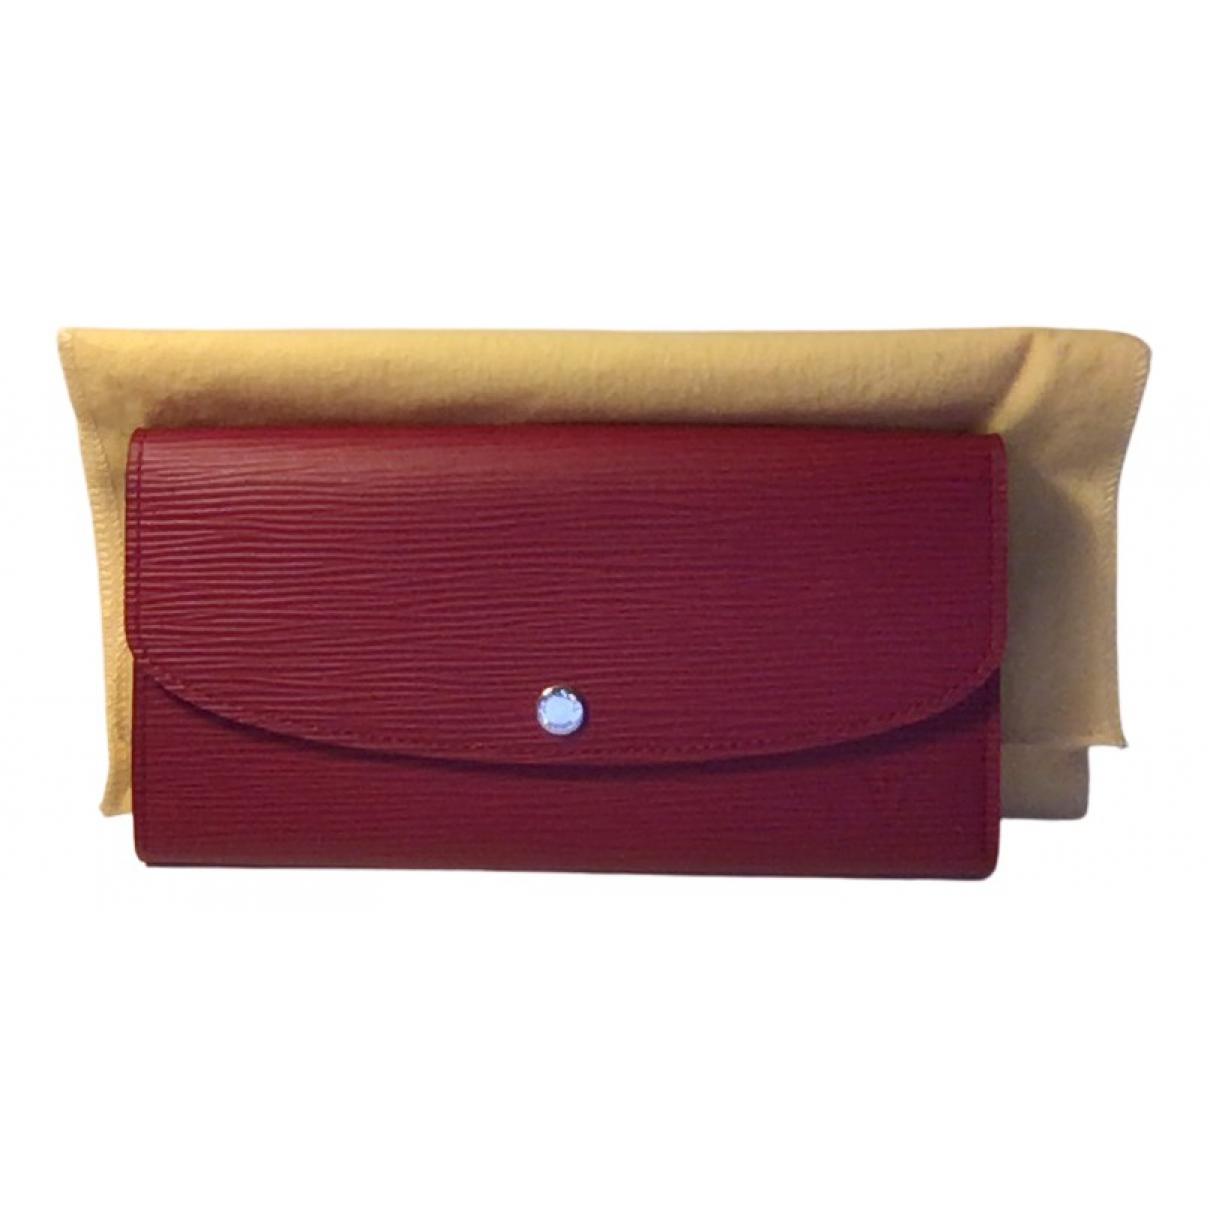 Louis Vuitton Sarah Pink Leather wallet for Women N